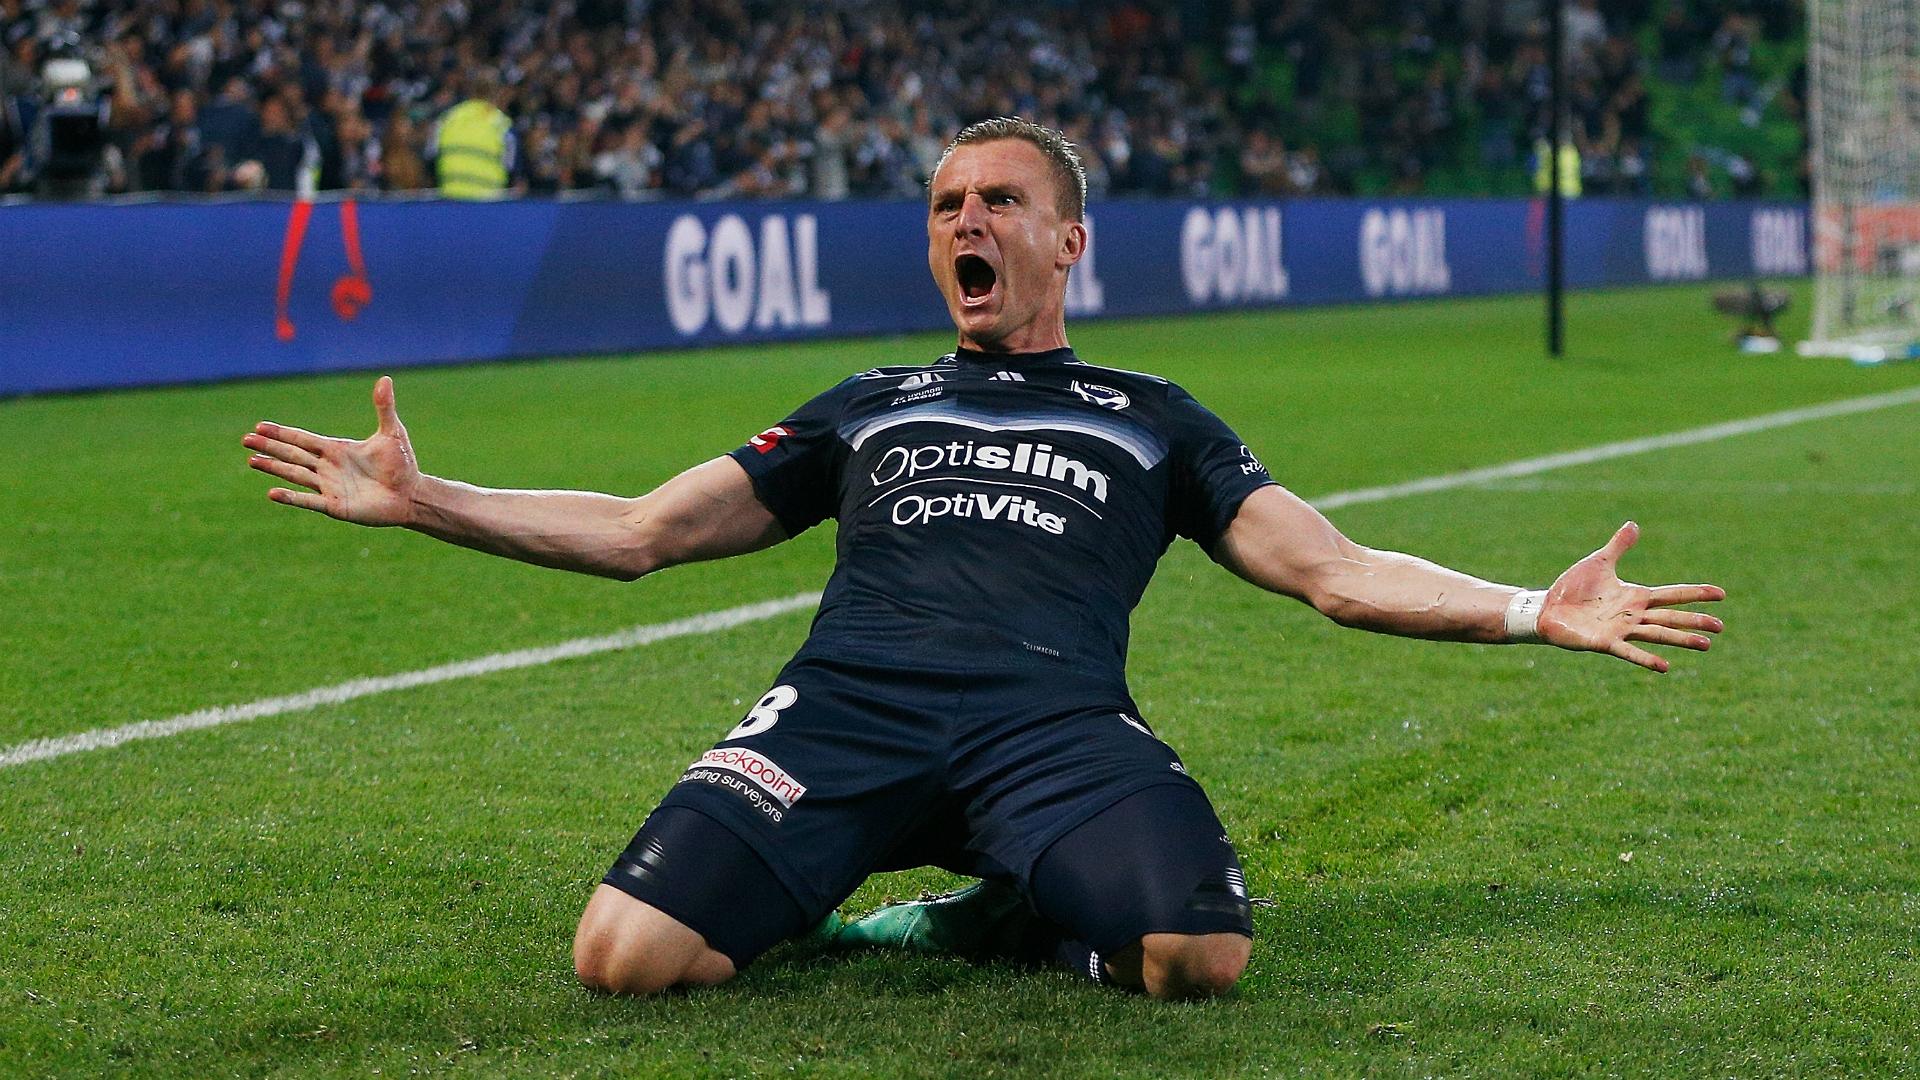 A-League and Australian football news LIVE: Berisha rejected by A-League clubs